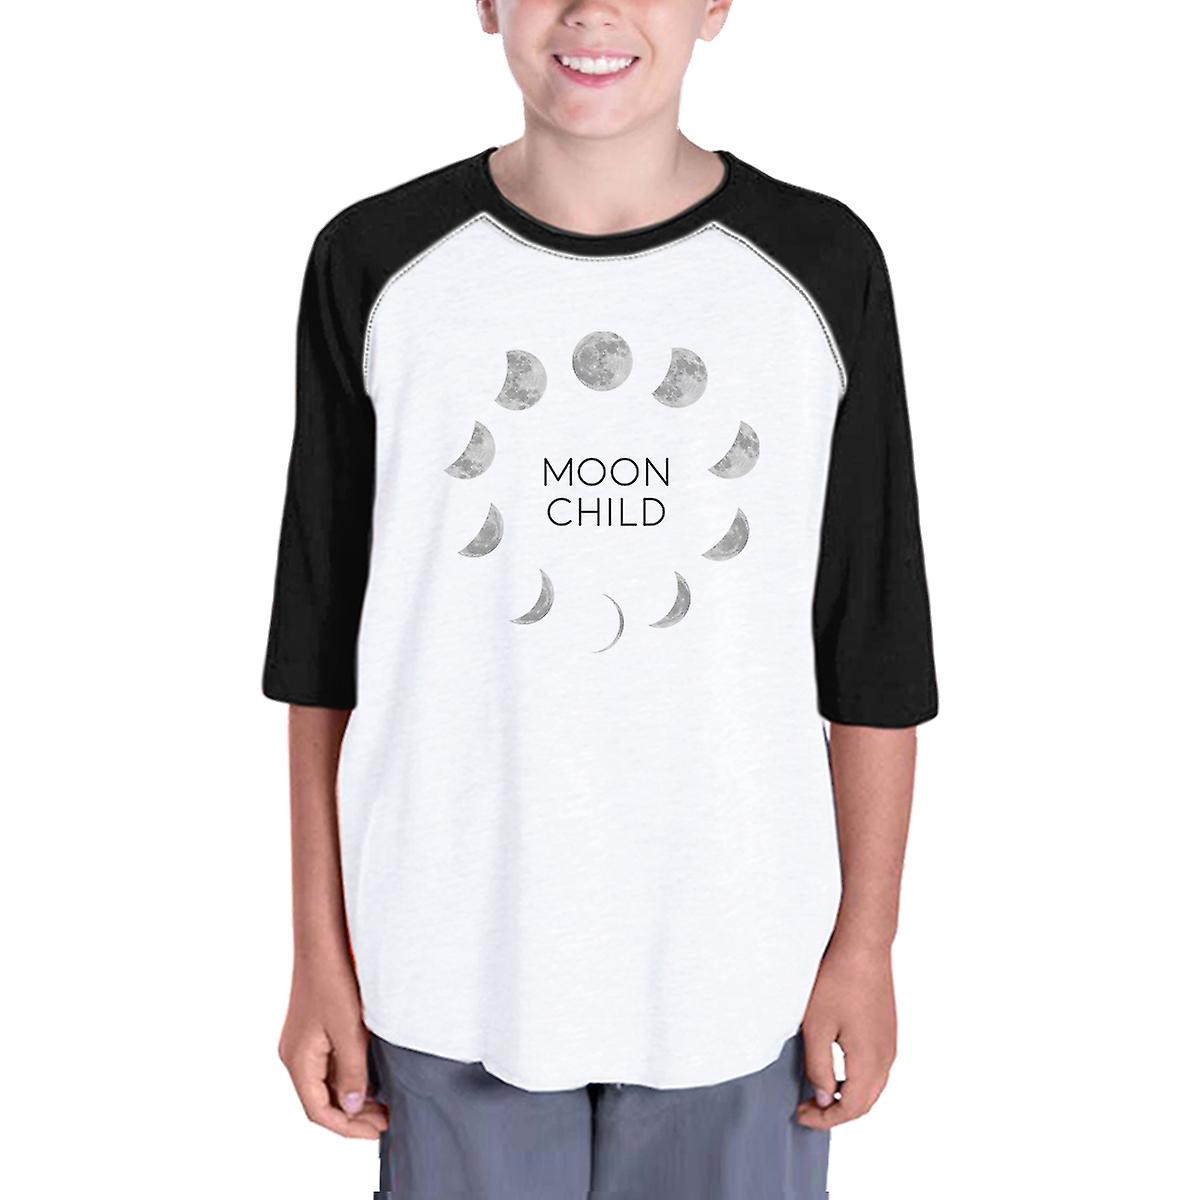 2605f95a8e74 Moon Child Tee Youth Graphic Raglan Shirt Horror Night Black Sleeve ...